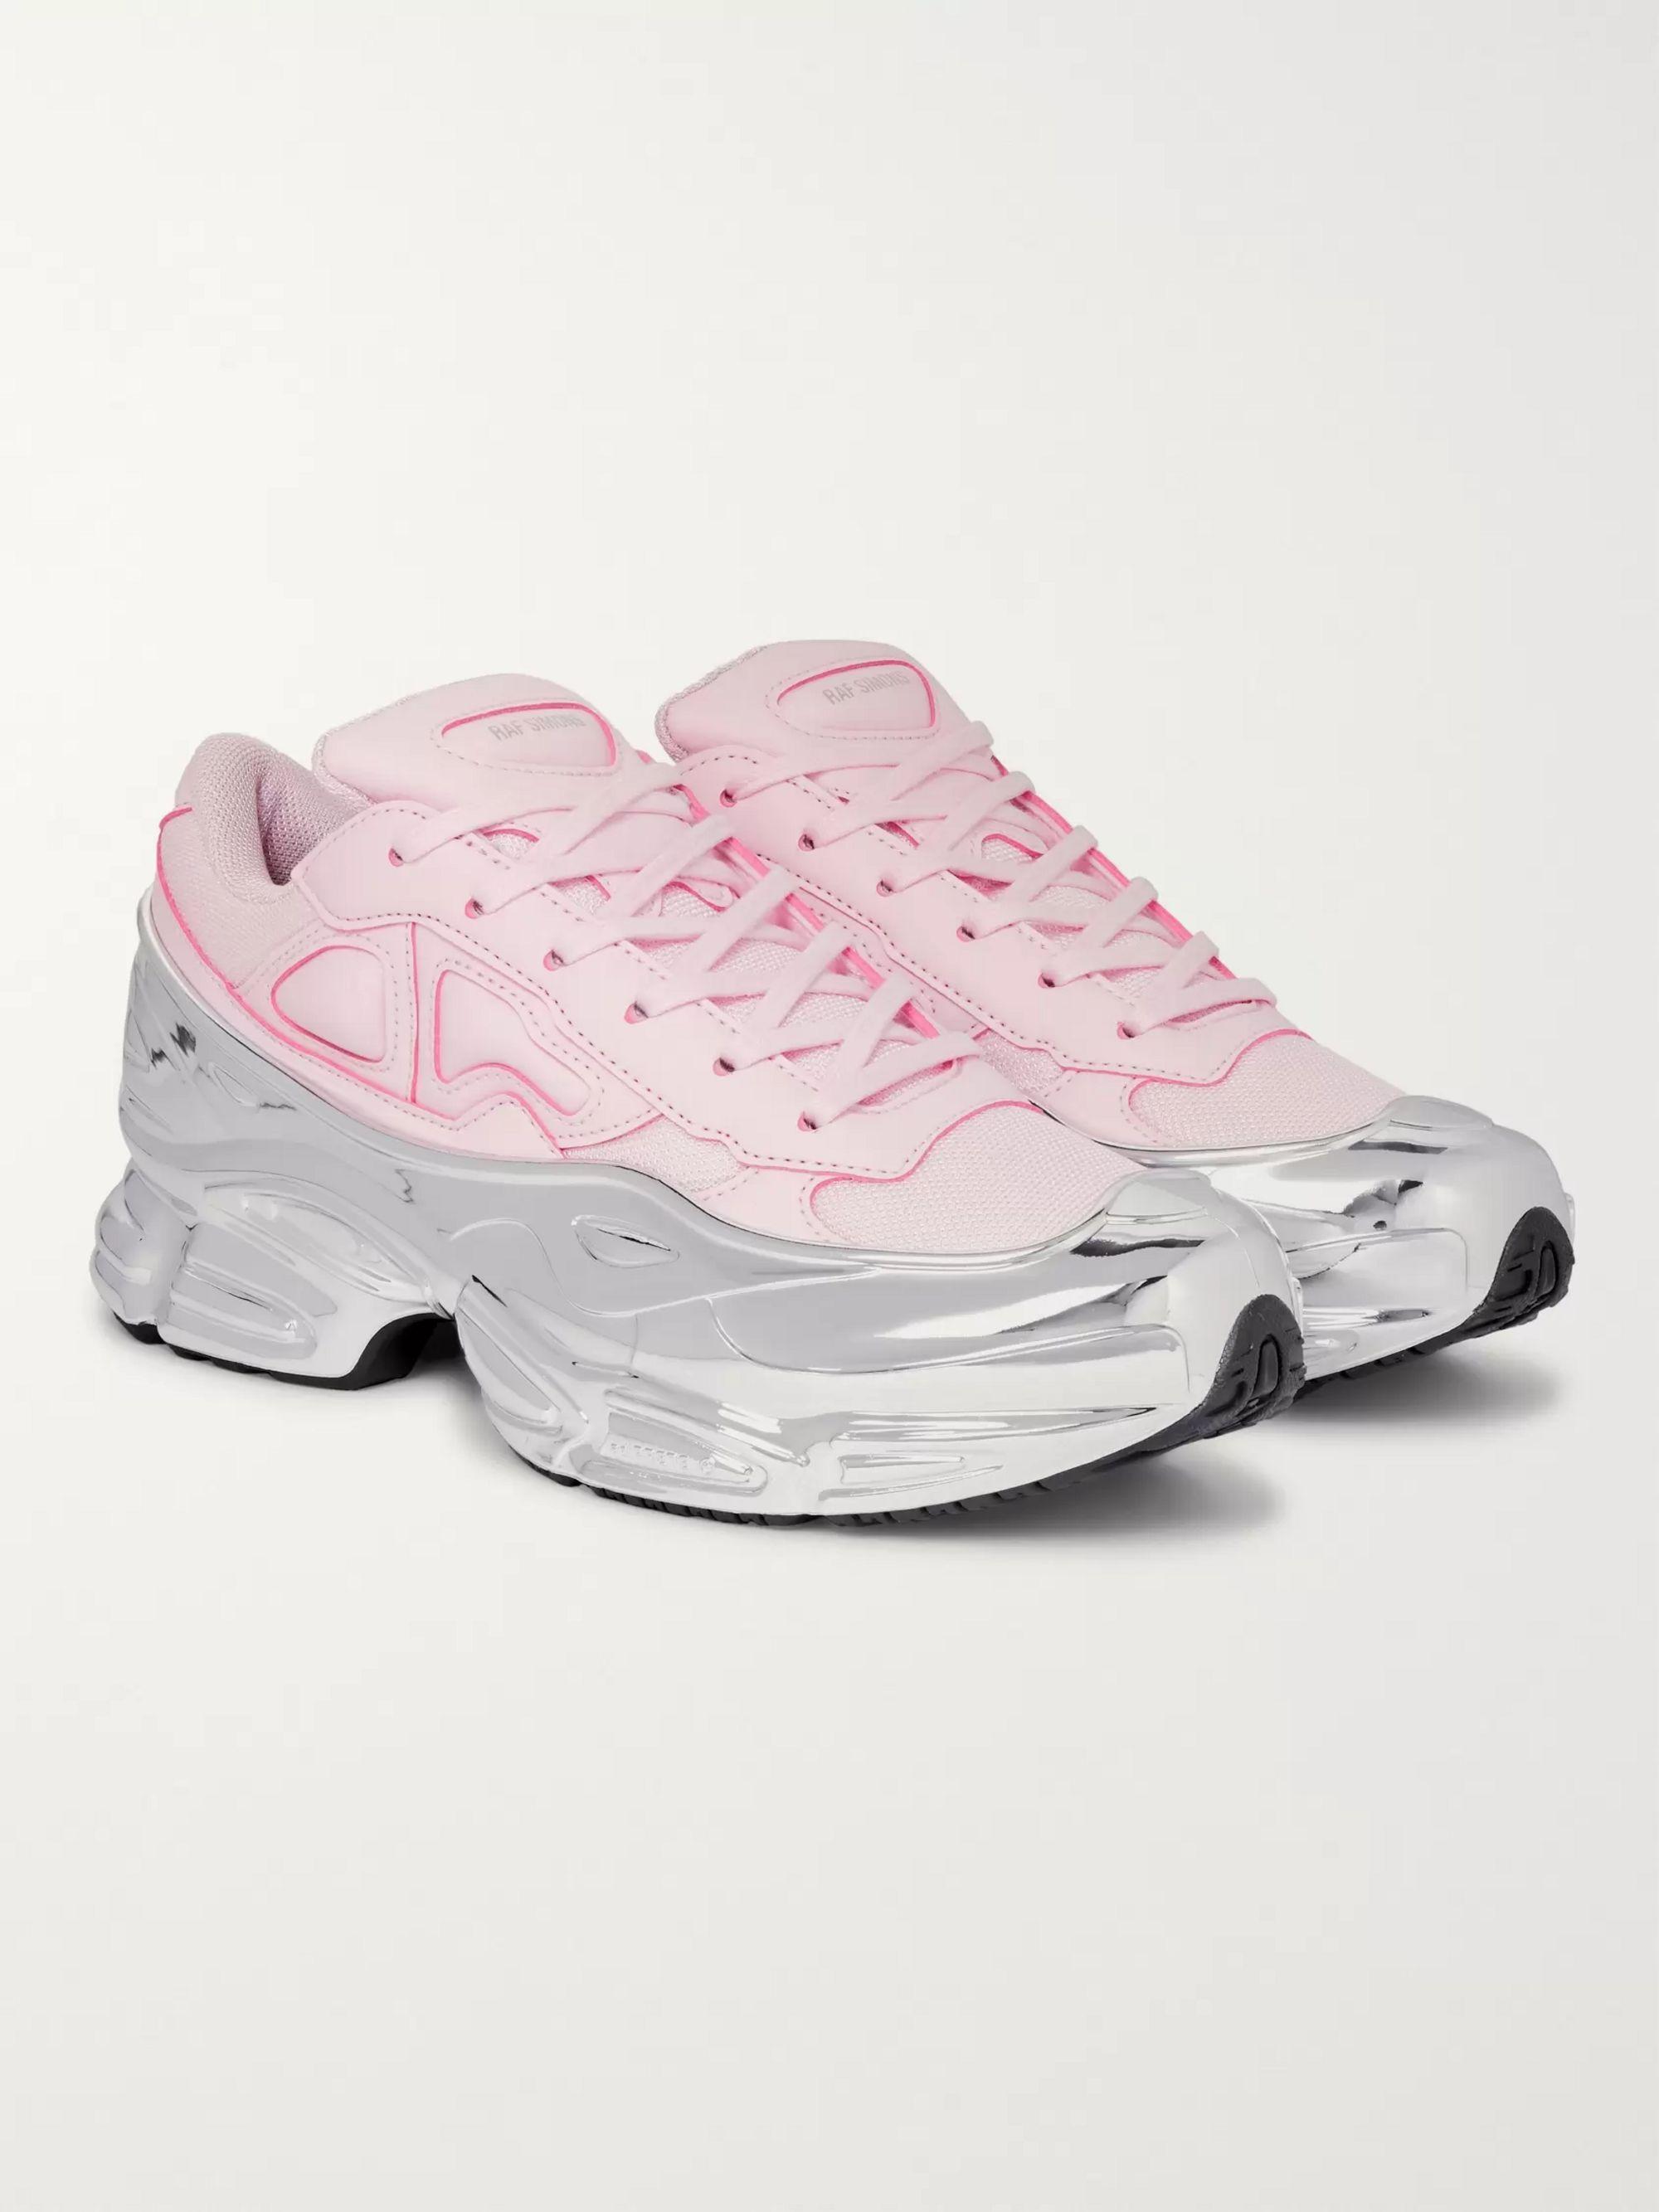 + adidas Originals Mirrored Ozweego Sneakers